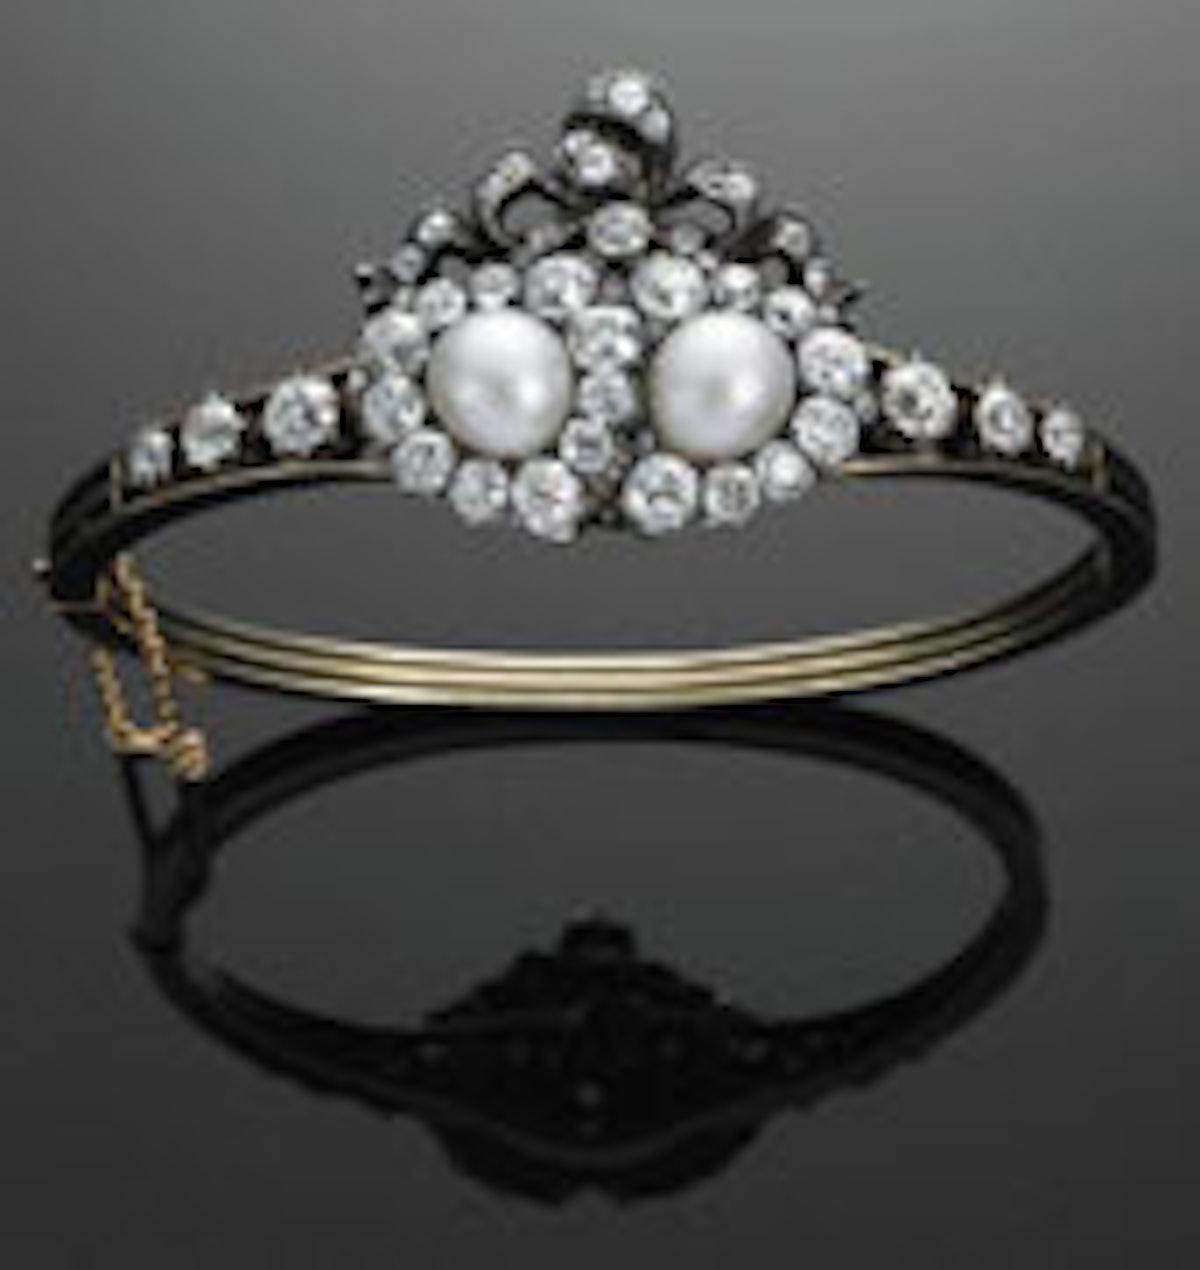 acss-royal-wedding-jewelry-search.jpg